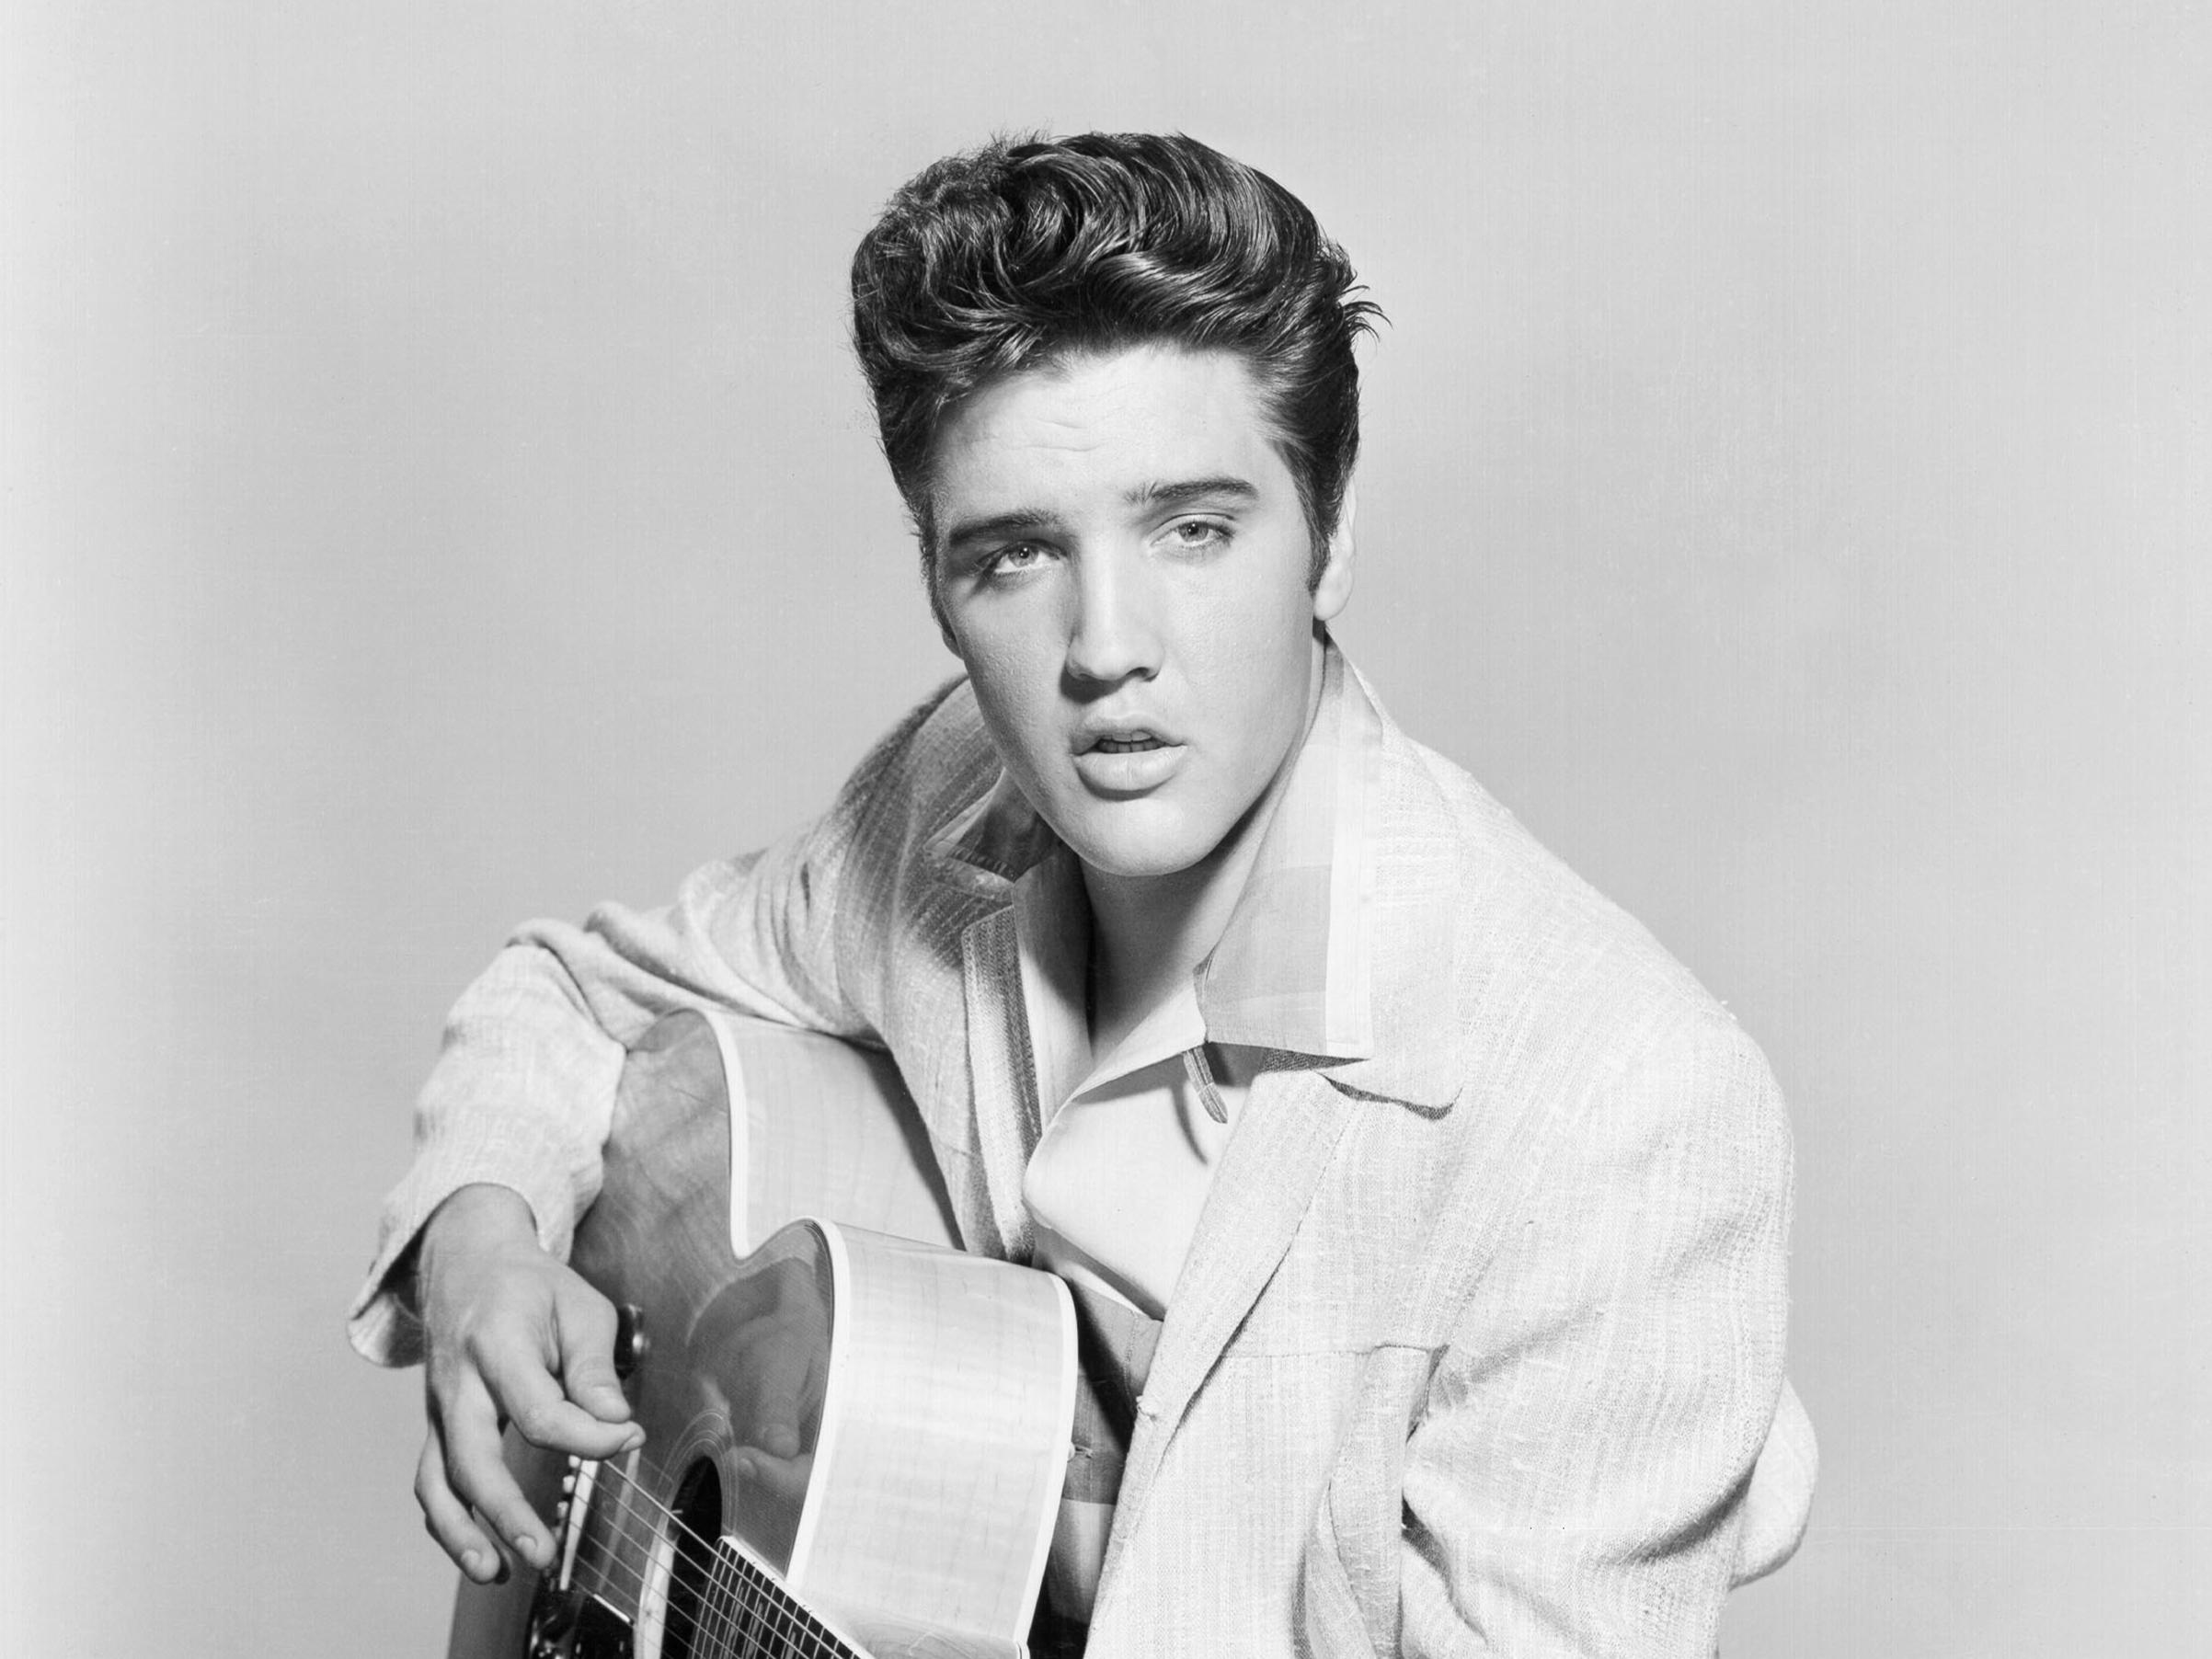 Orquestra Filarmônica do Ceará apresenta concerto em tributo a Elvis Presley